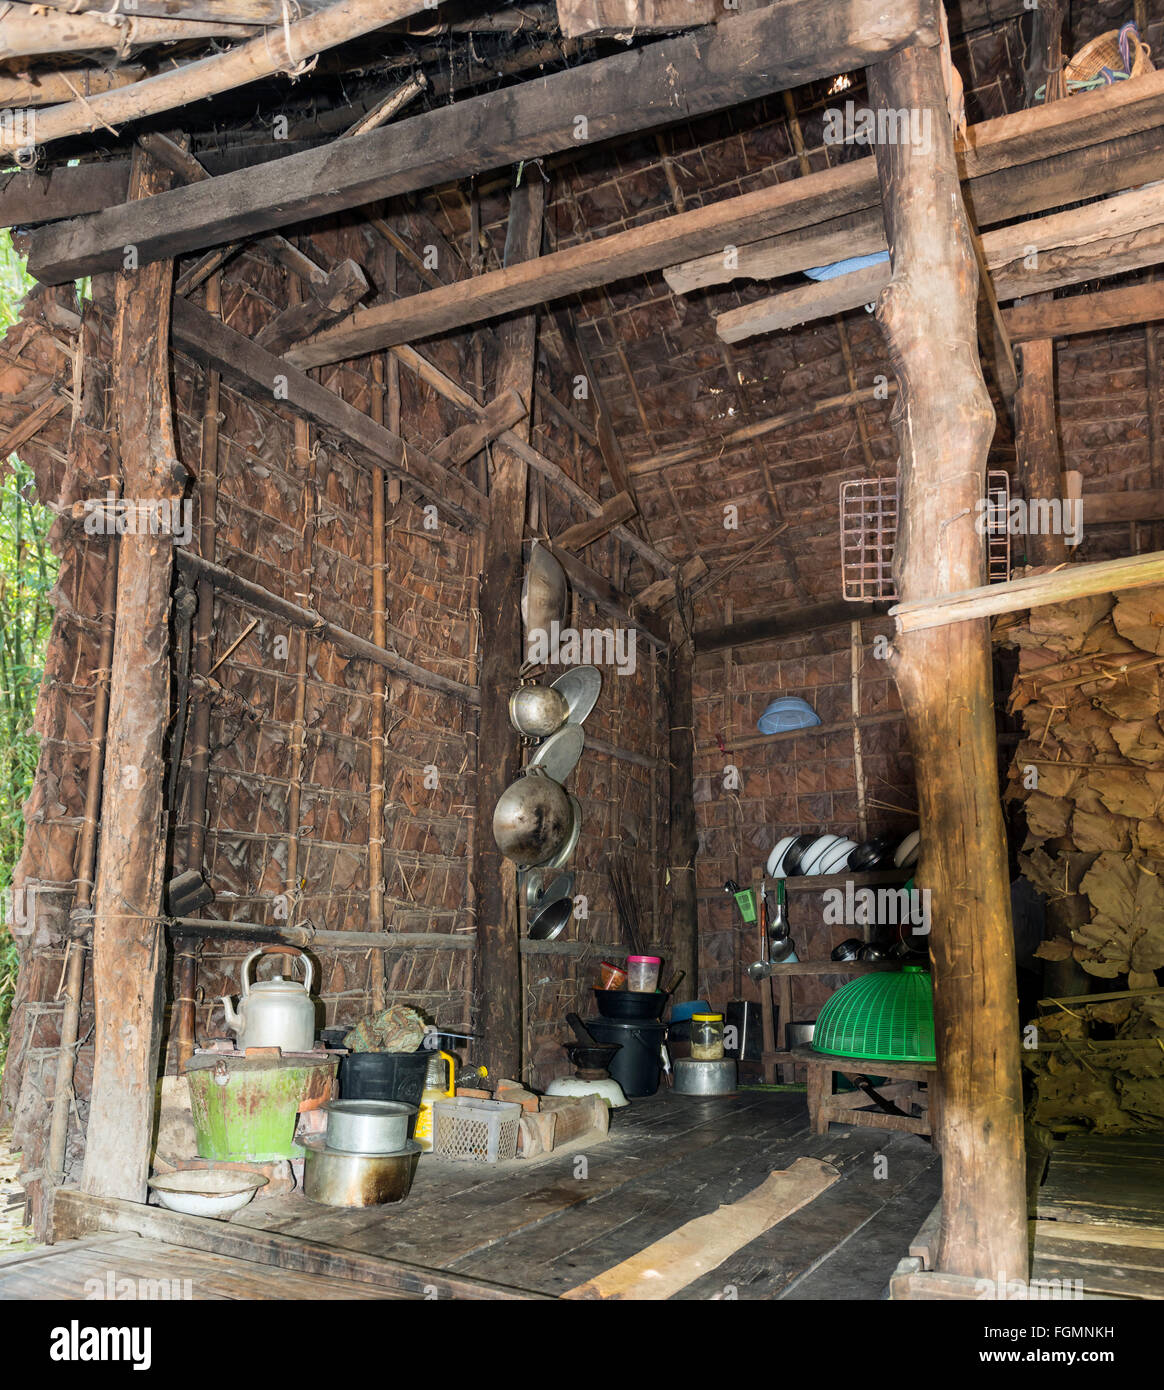 Primitive kitchen, Burma - Stock Image